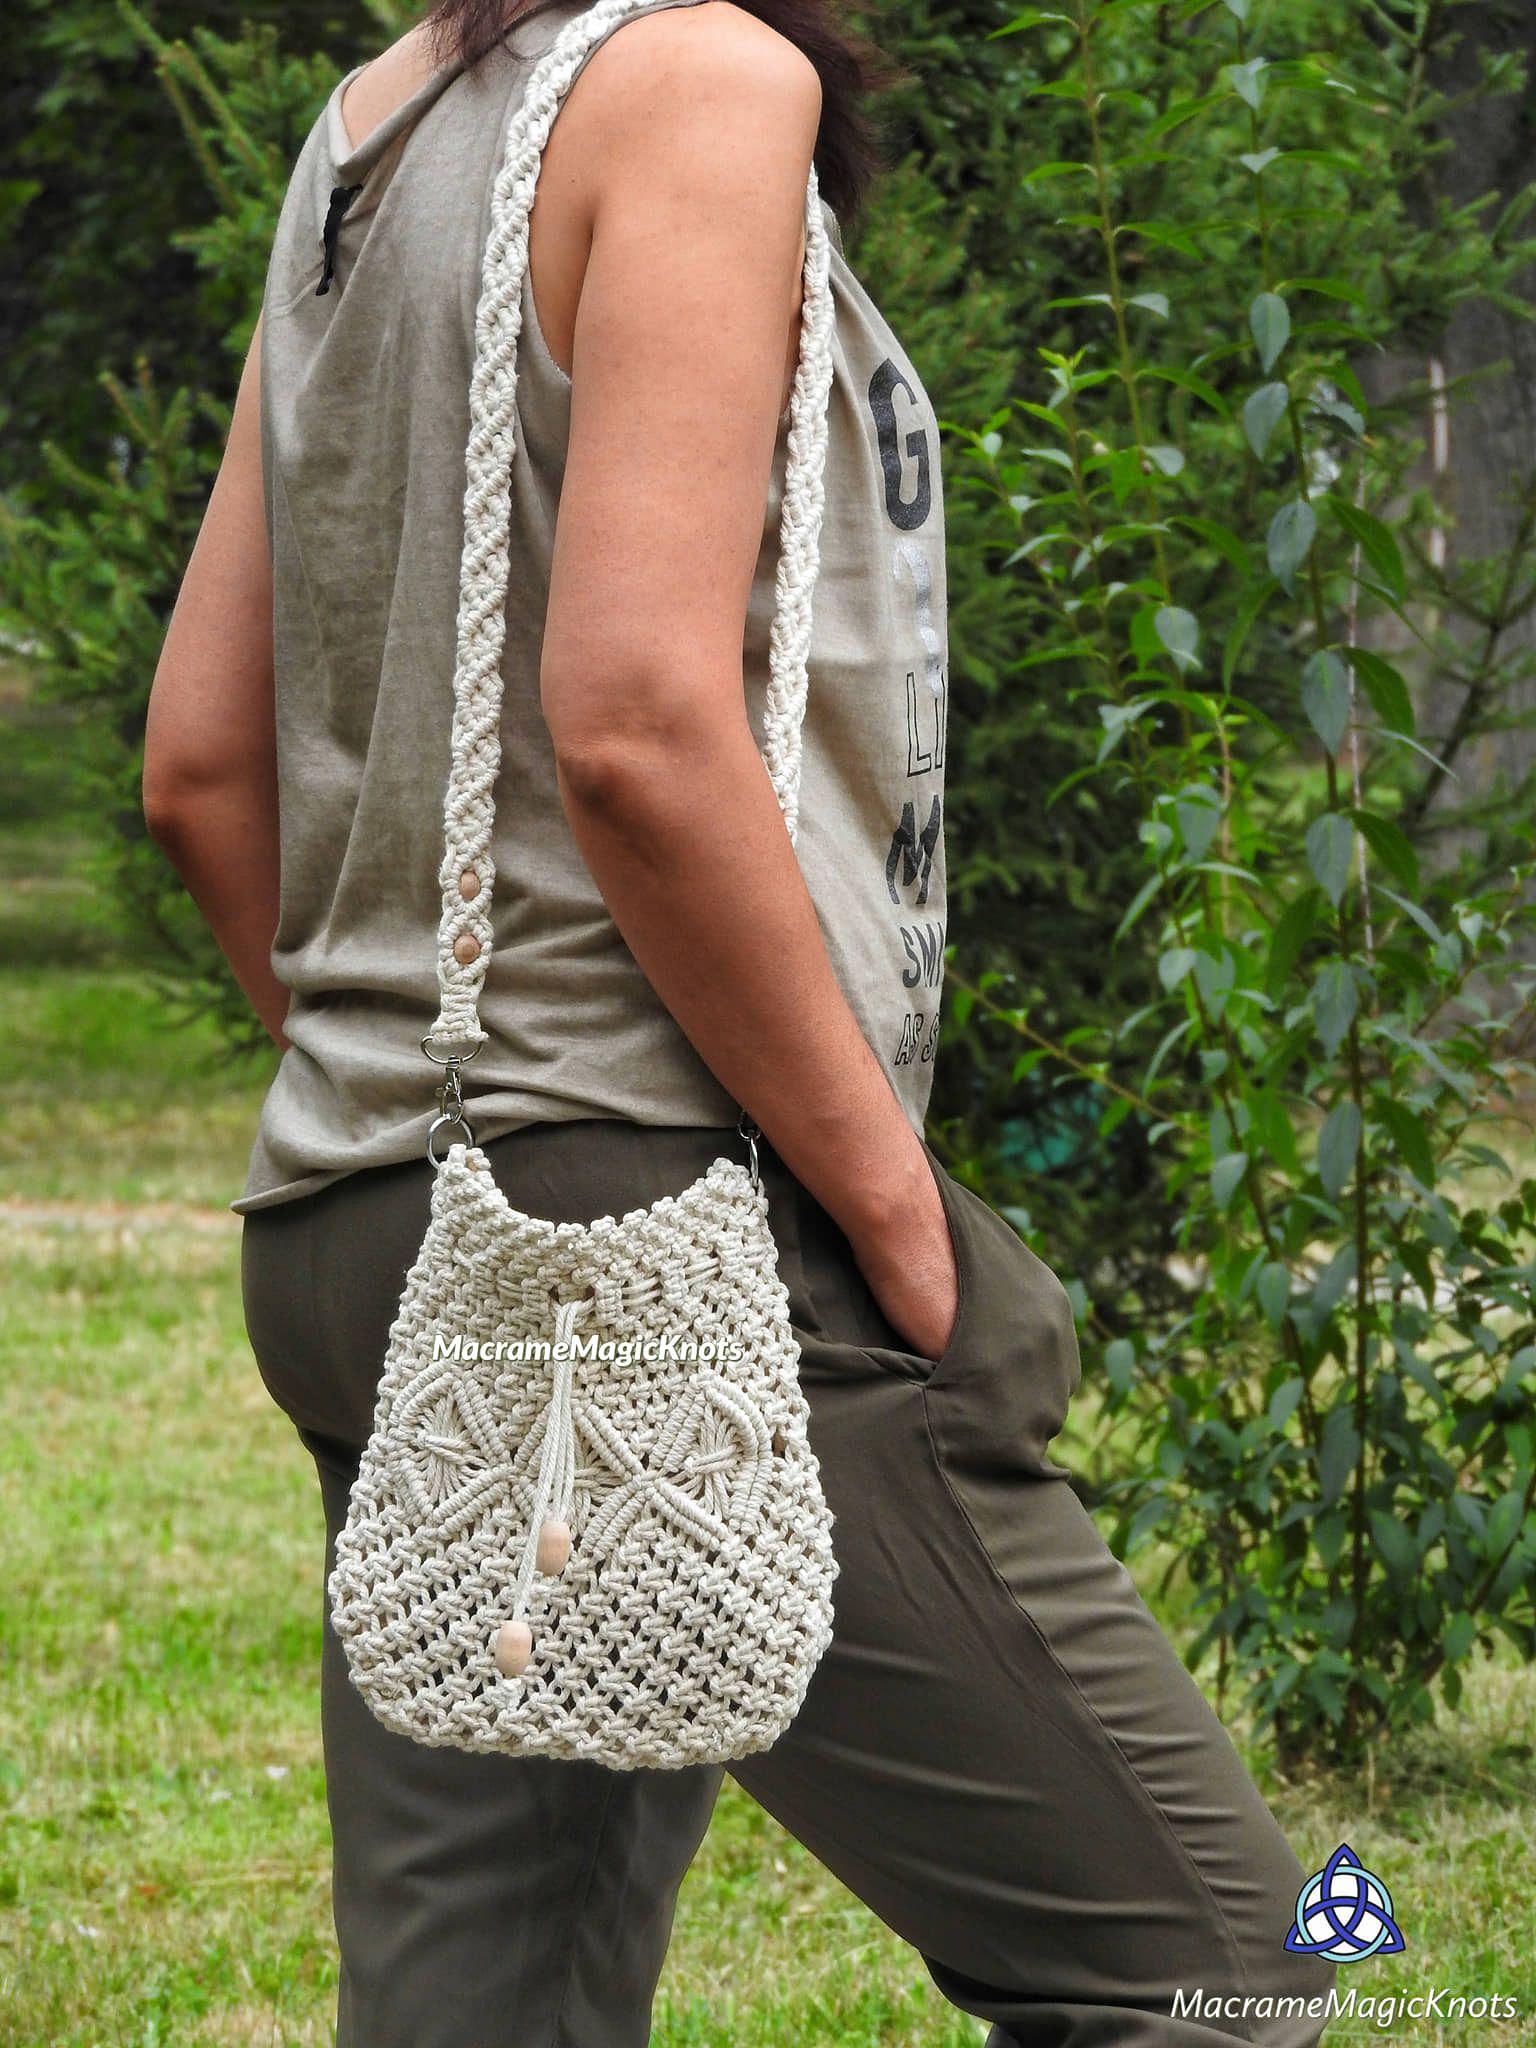 Macrame Bag Tutorial | Macrame Bag Pattern | Macrame Bag for Beginners | Macrame Pattern